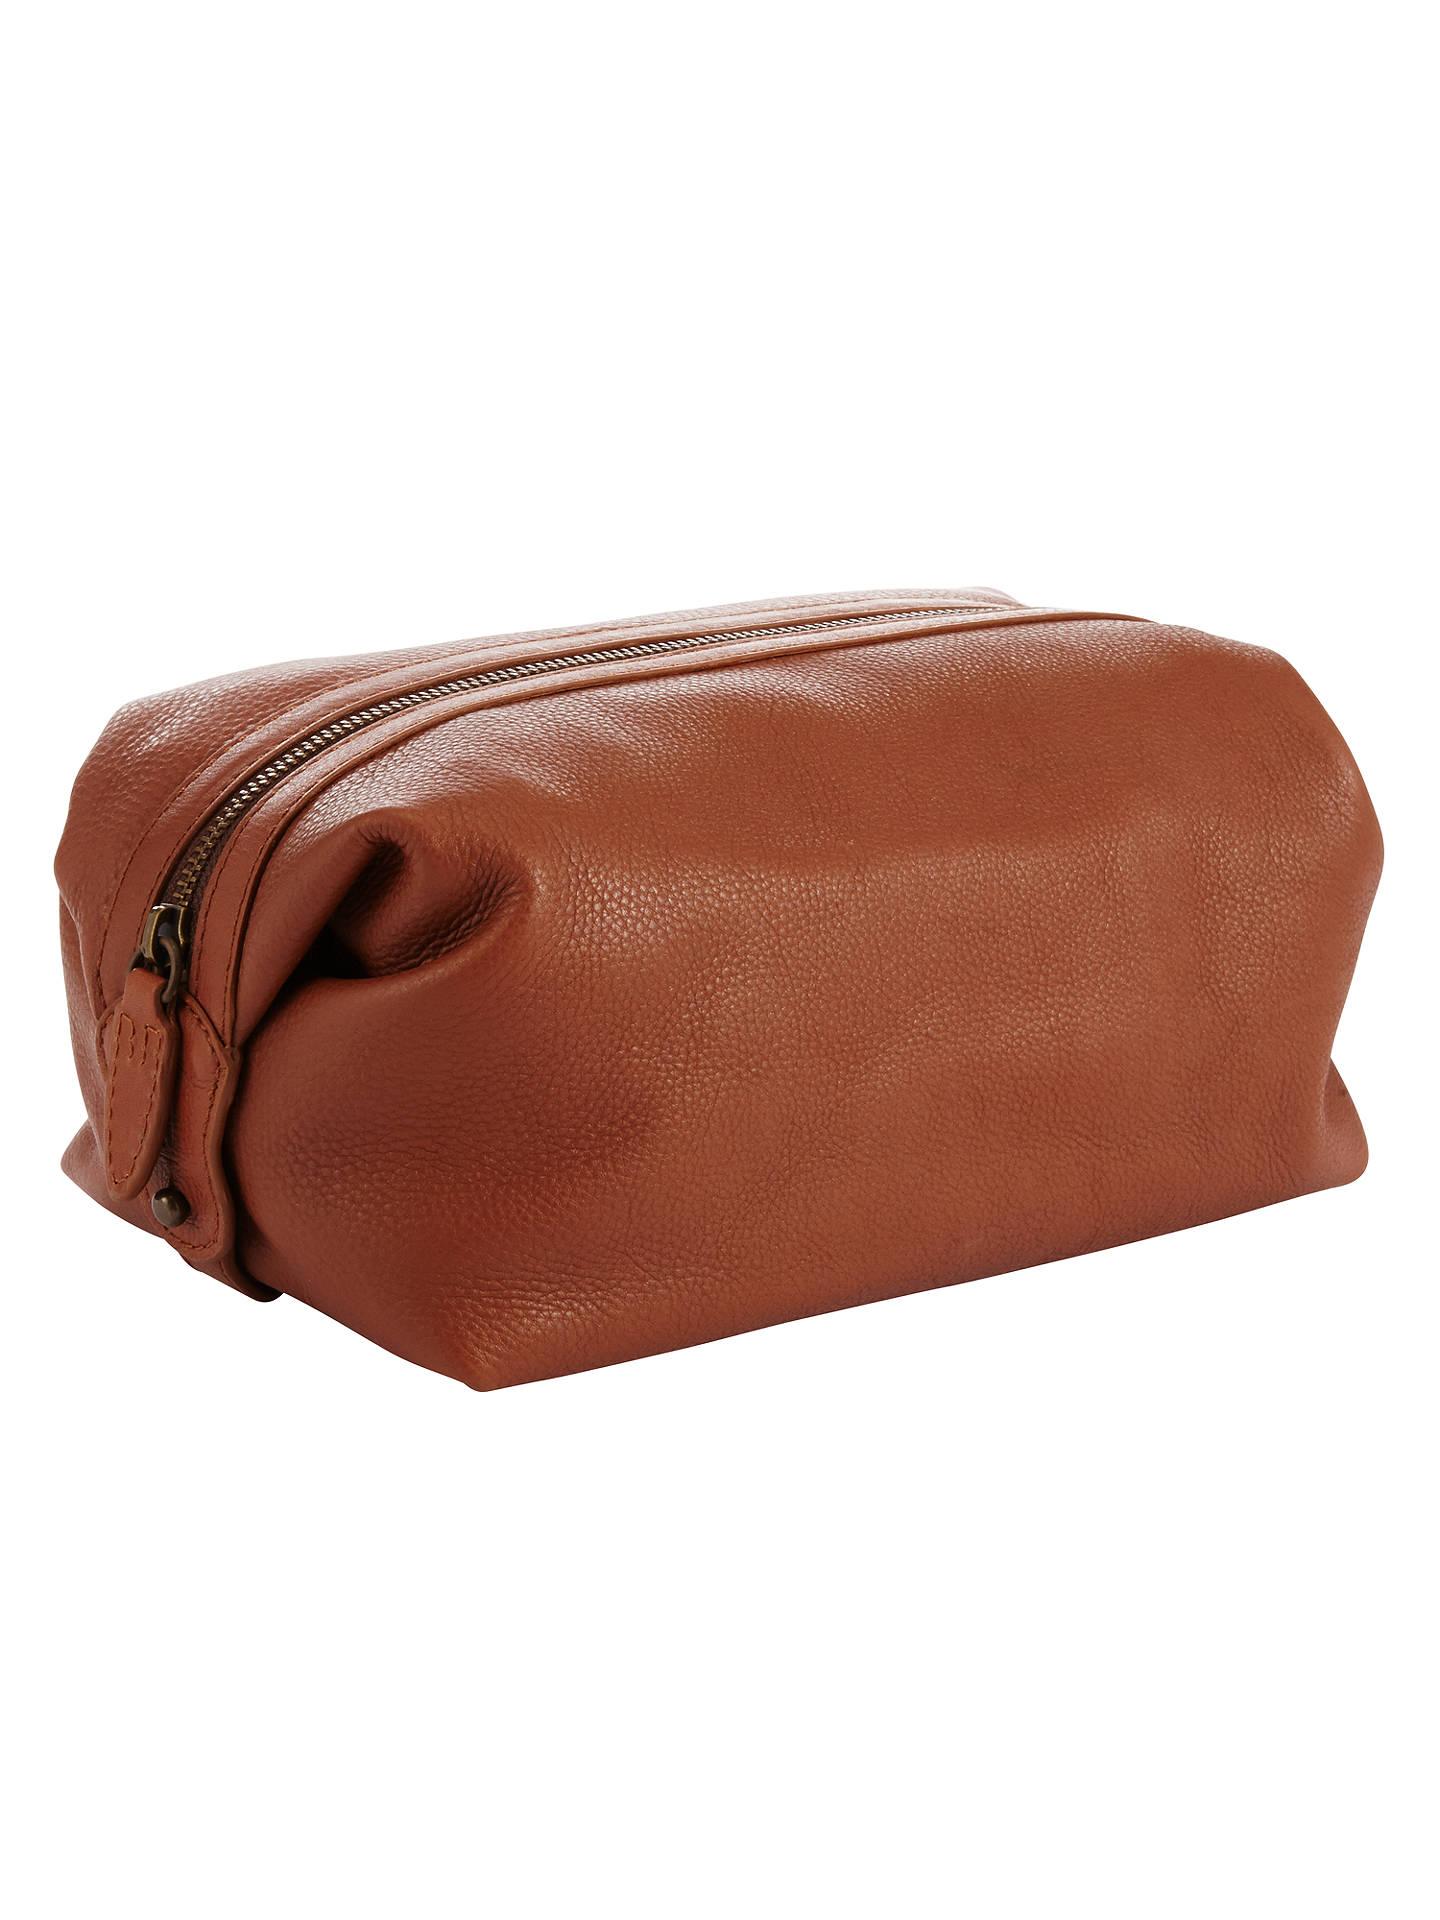 promo code bec42 3305f buypolo ralph lauren pebble leather wash bag ... 2262895600